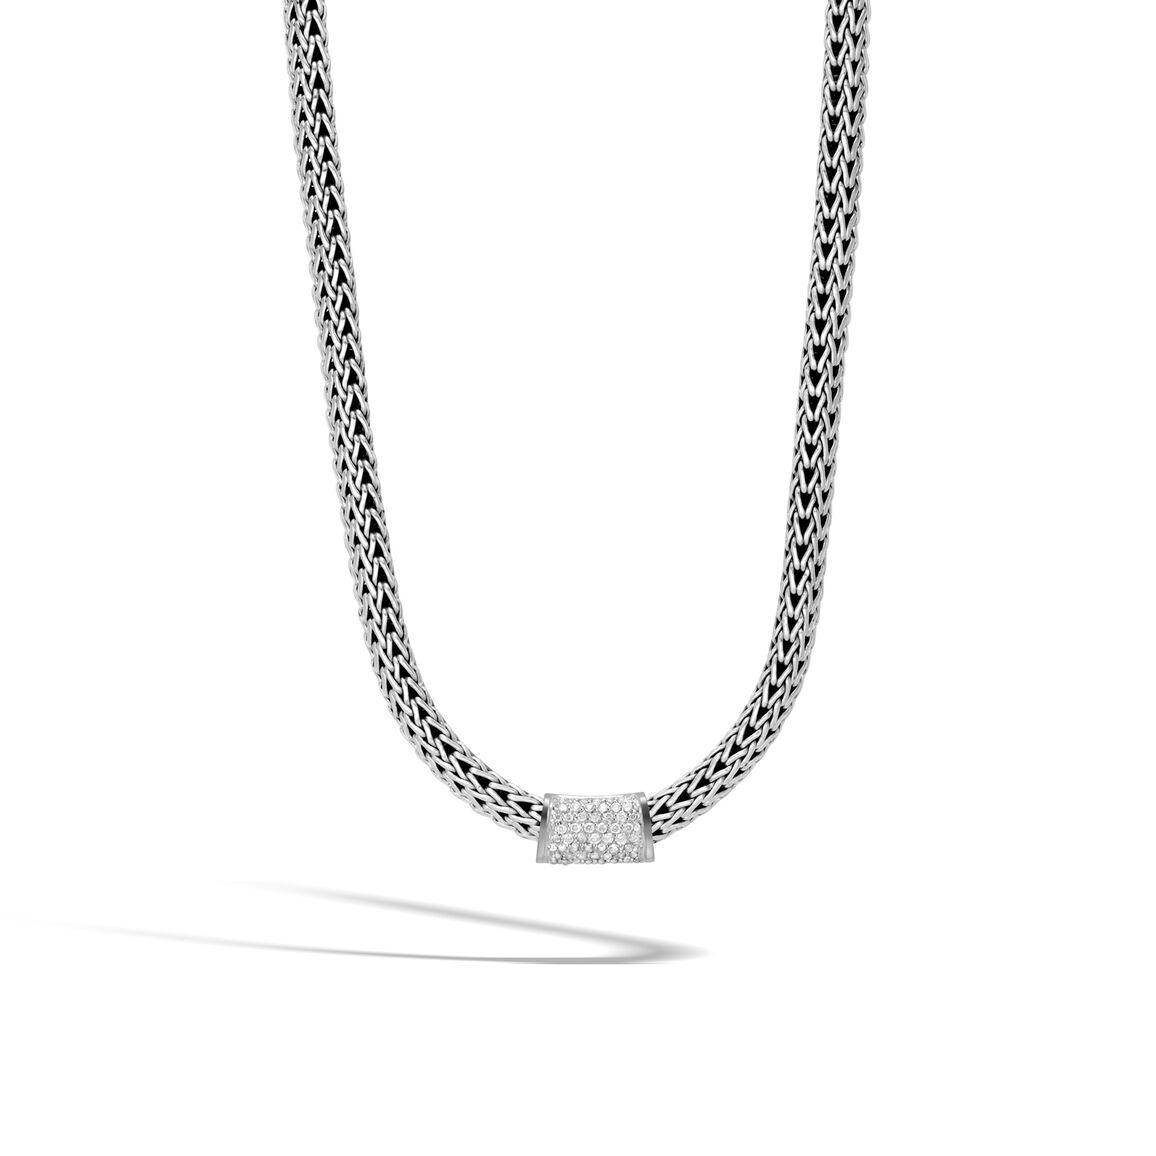 Classic Chain Pendant in Silver with Diamonds